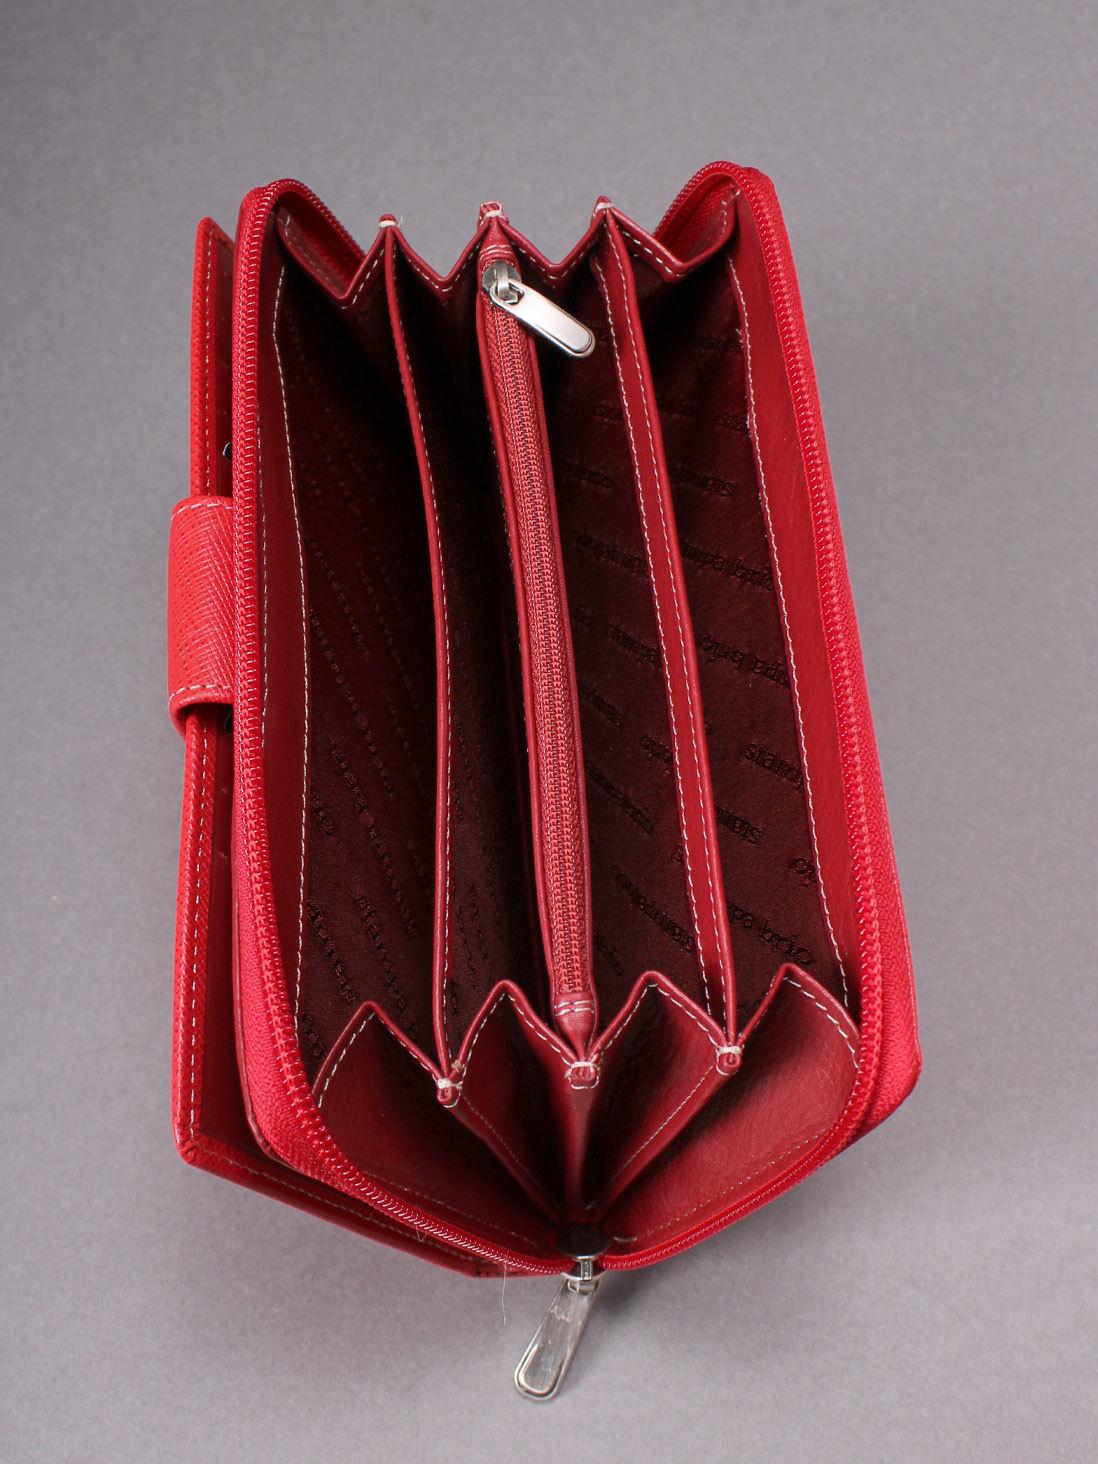 936 R - Портмоне-клатч с RFID защитой